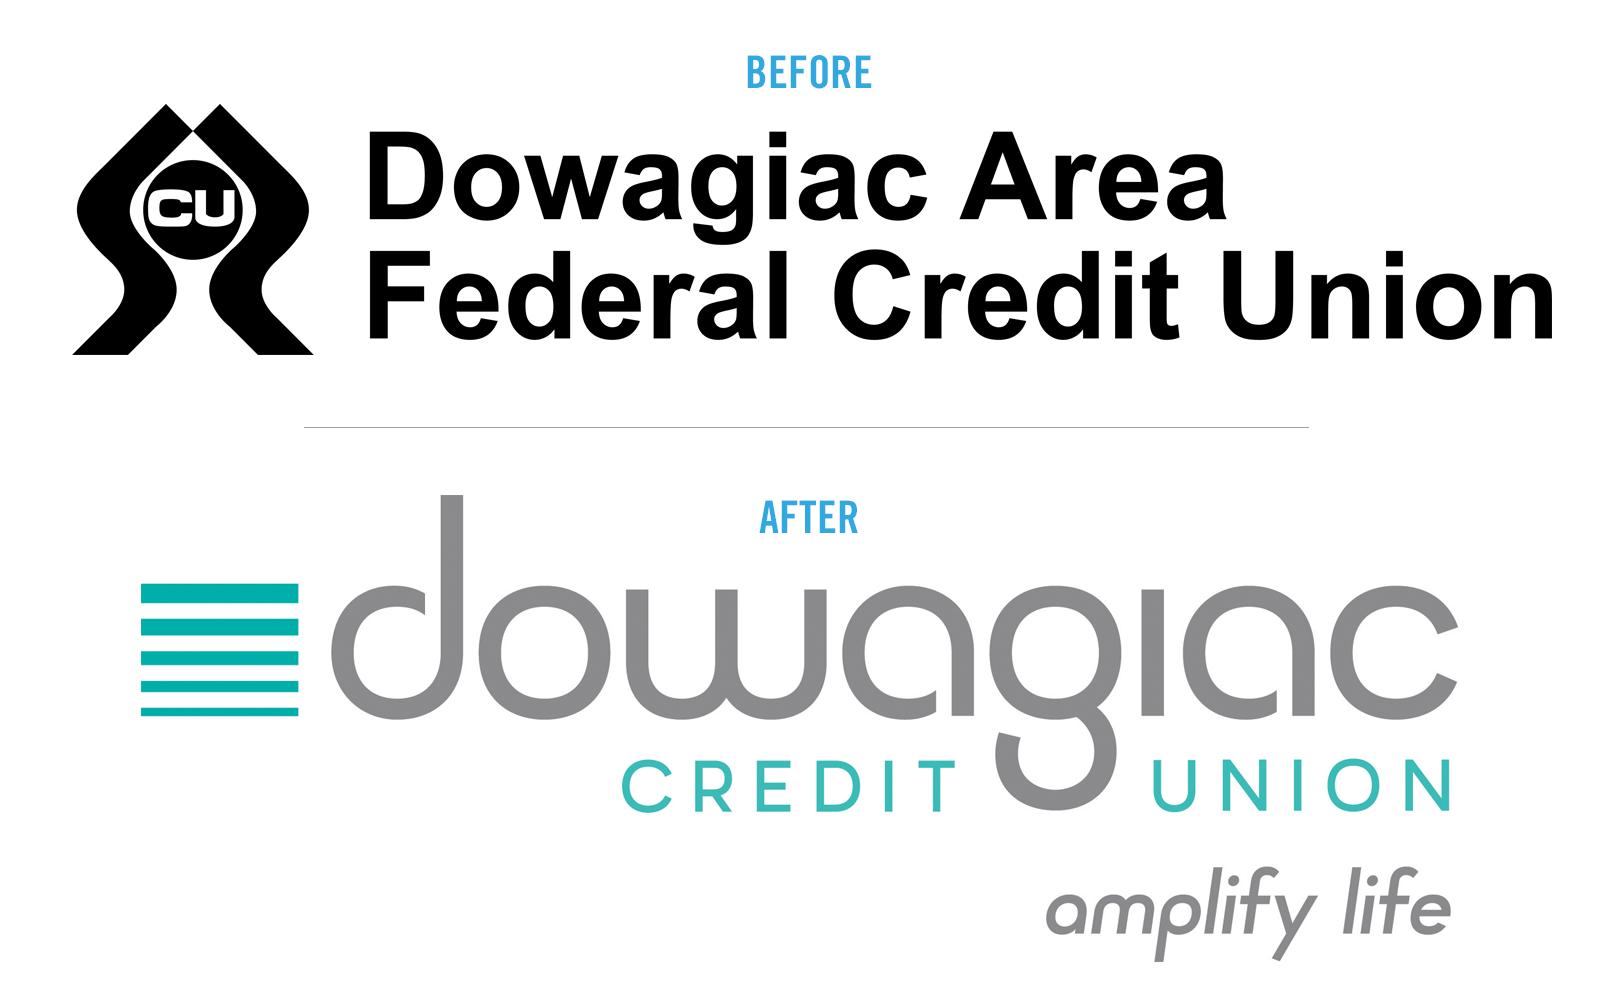 dowagiac fcu logos before after.png